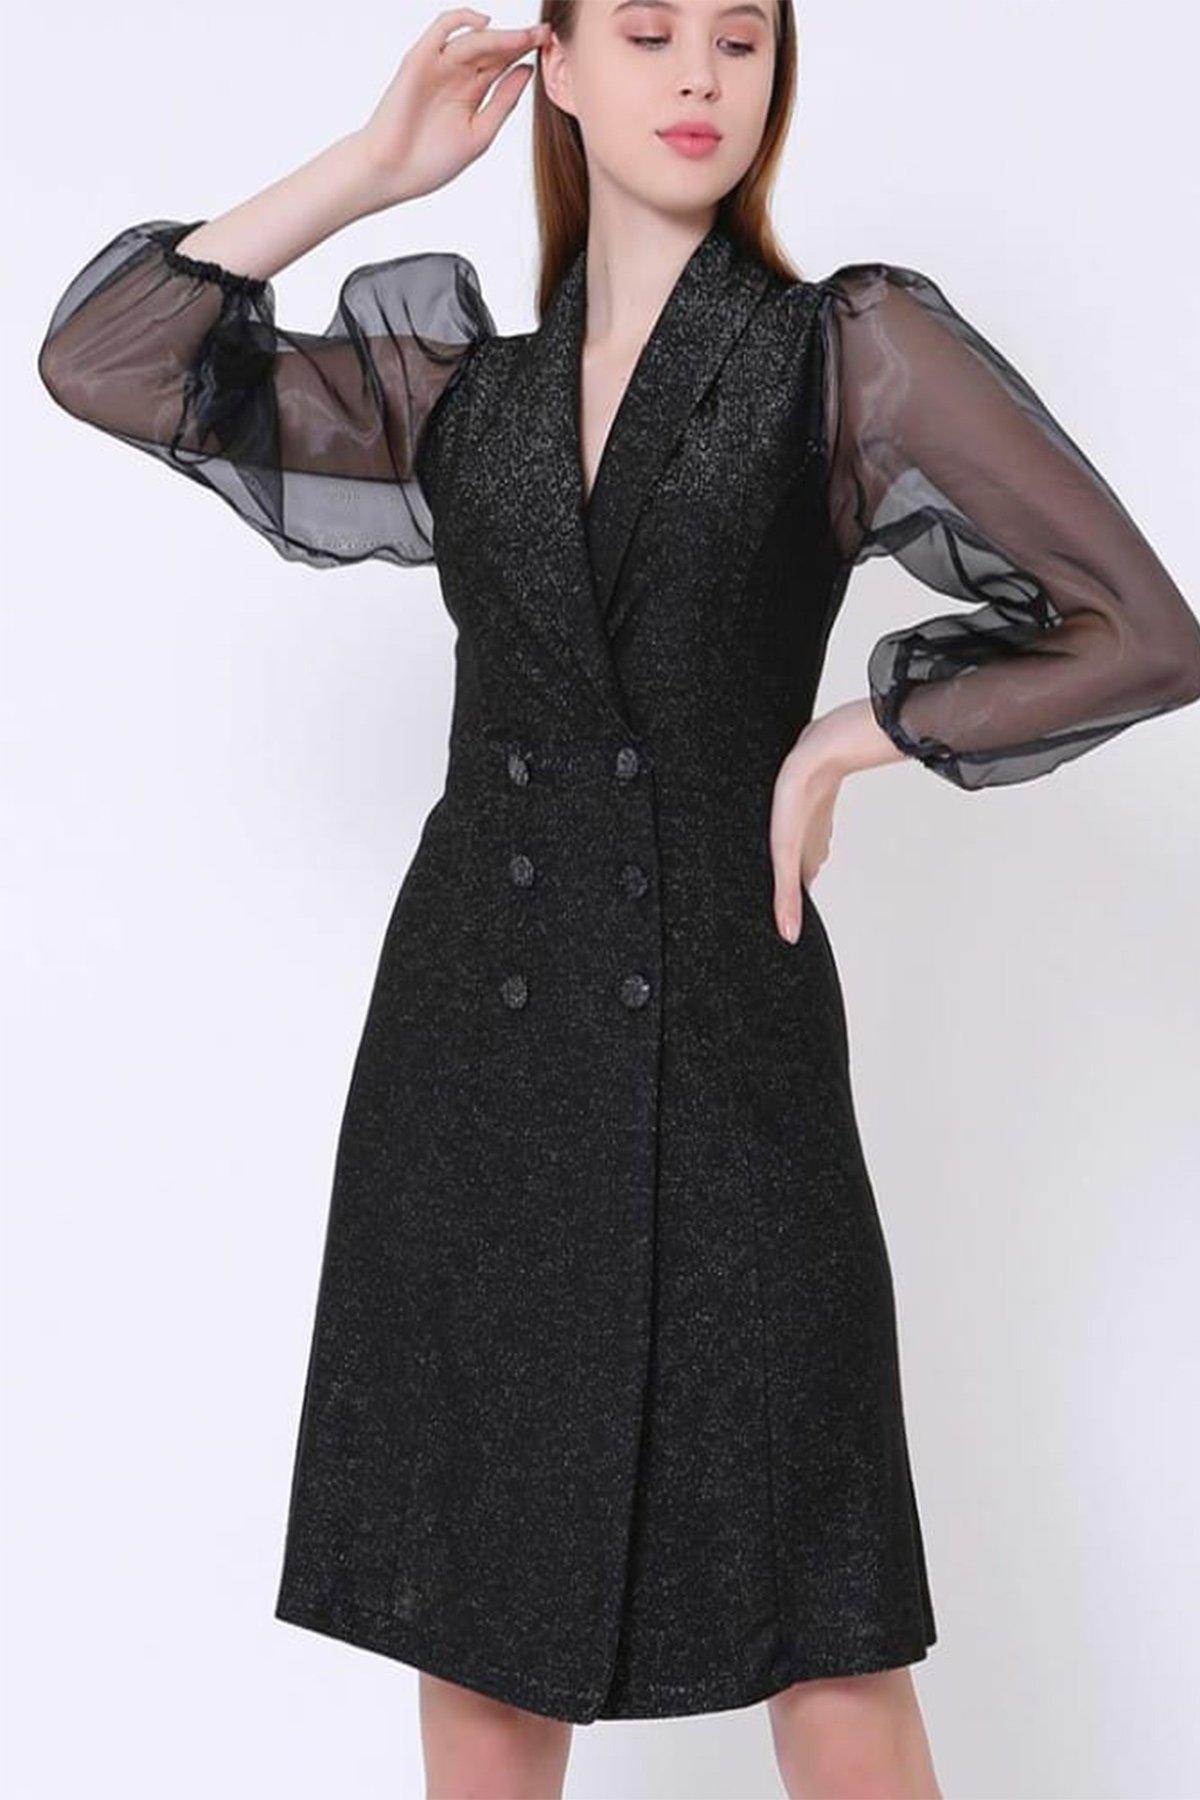 https://resim.oddamoda.com/p004005/siyah/machek-kadin-elbise-5481-80301-6219.jpg